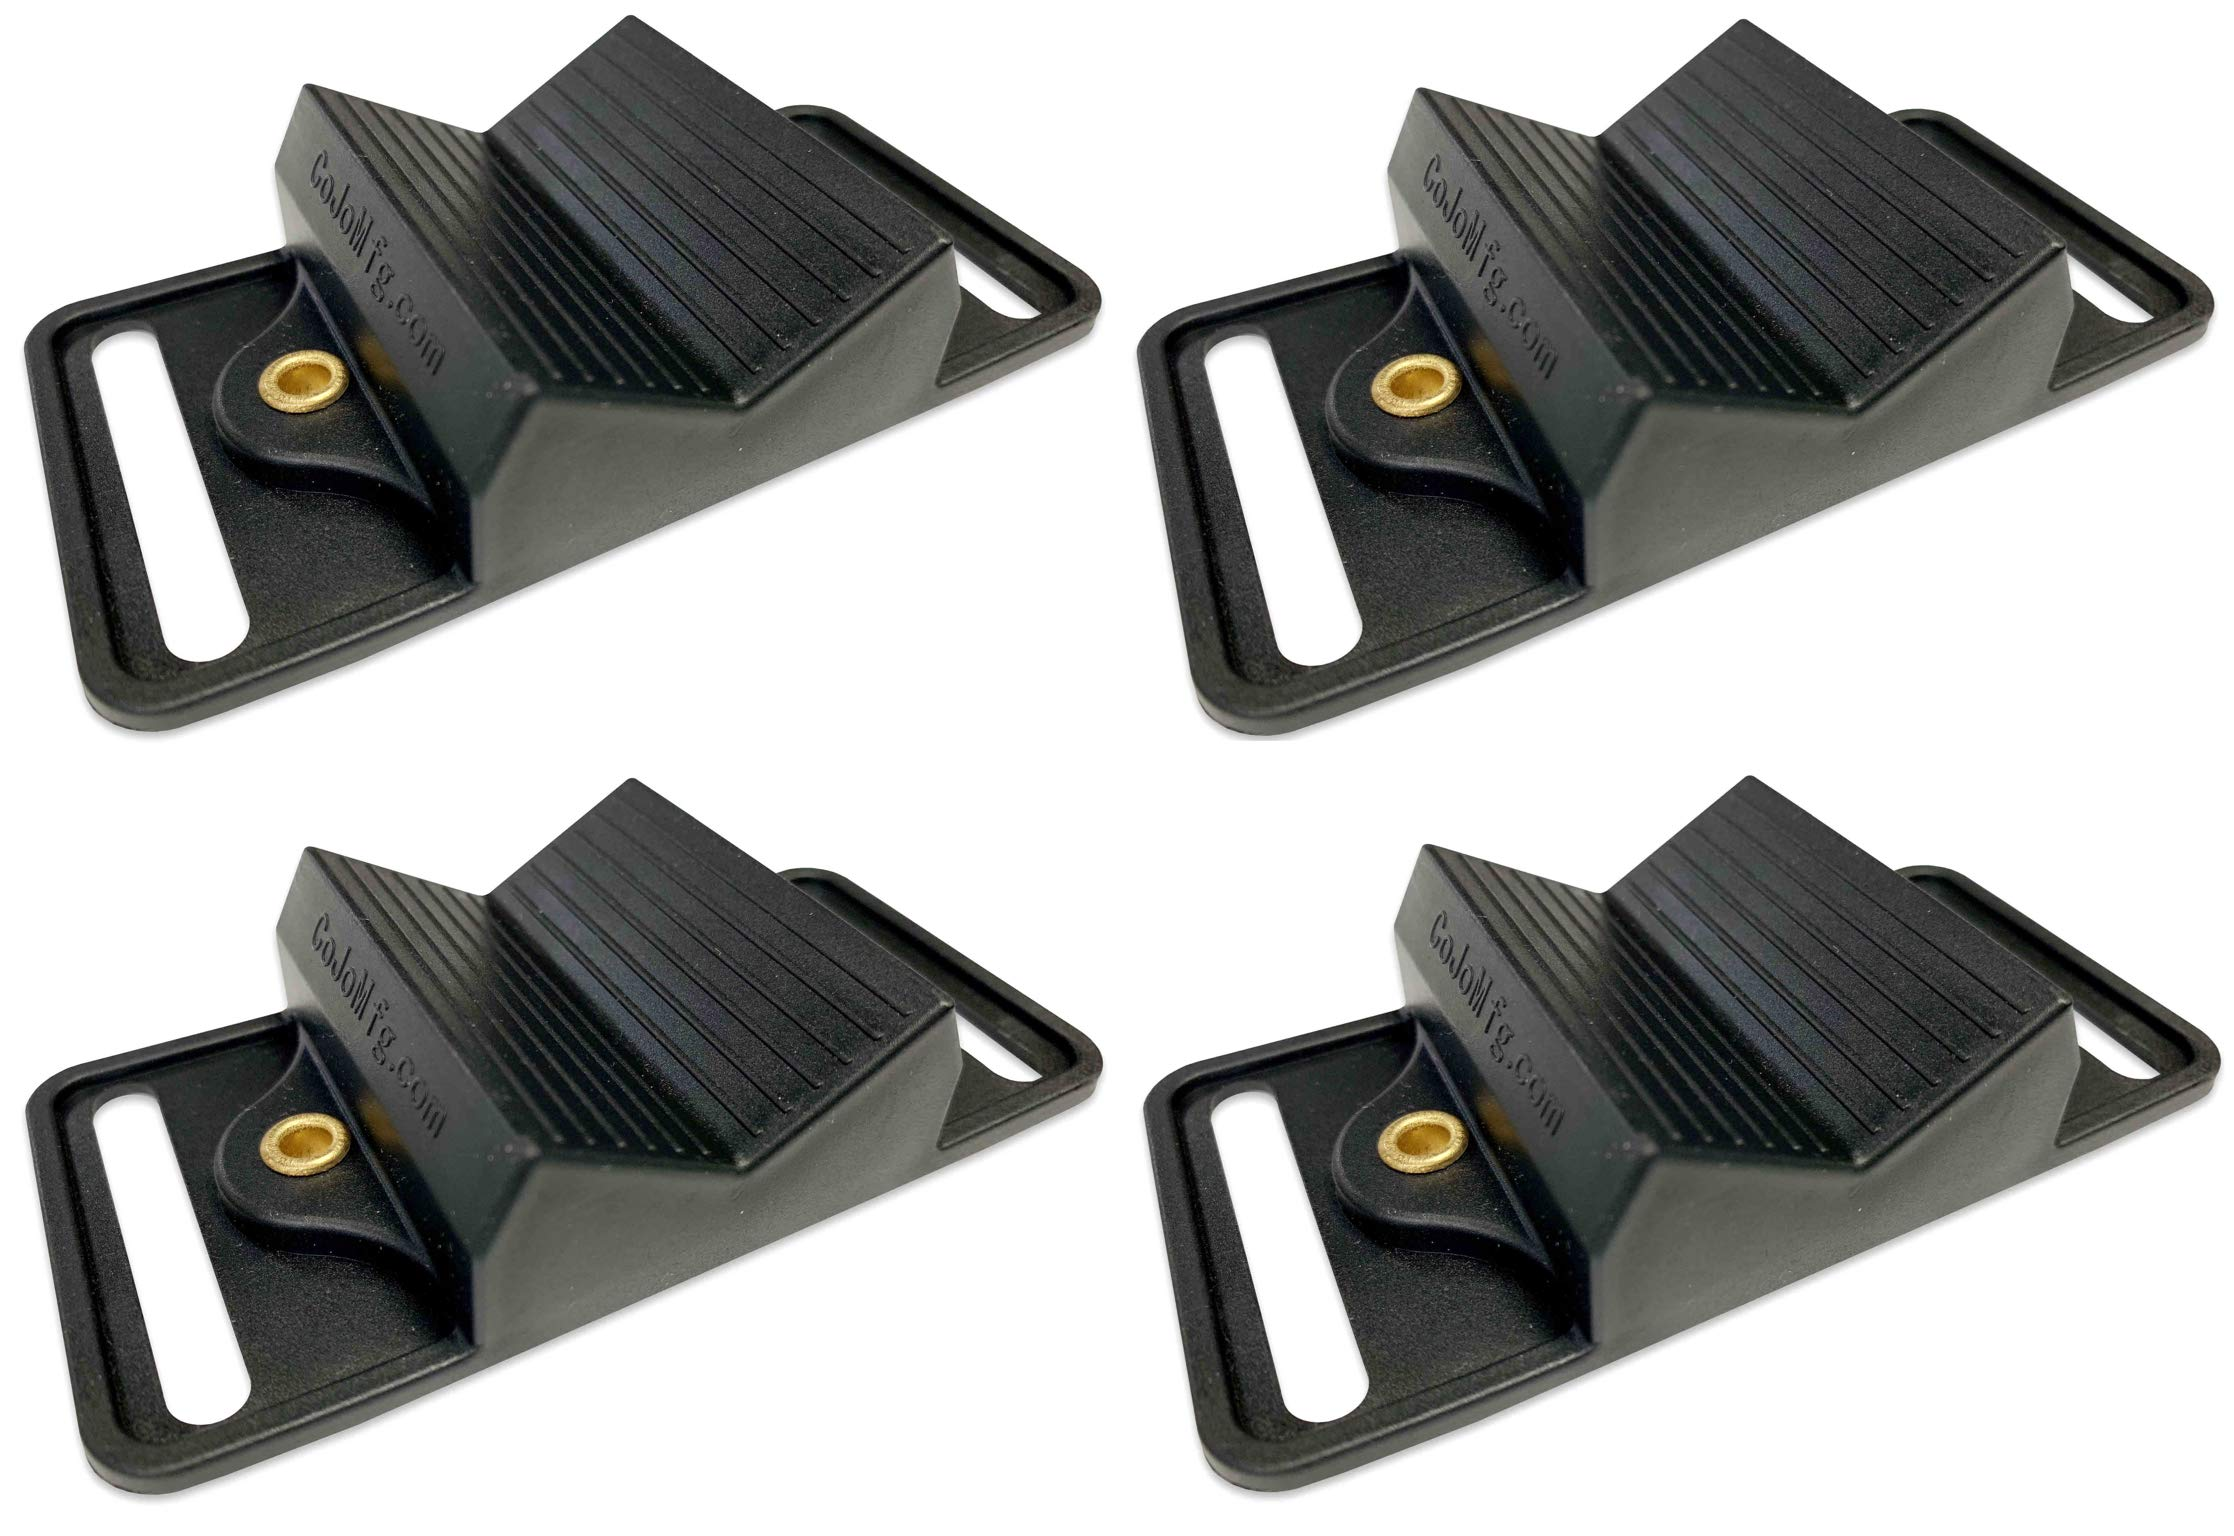 COJO MFG. 4-Pack of Gun Magnet Mount Anywhere, Non Scratch, Gun Holder for Car, ATV, Side by Side, Bed Side- Shotguns in Duck Blinds, Deer Blinds, Deer Stands